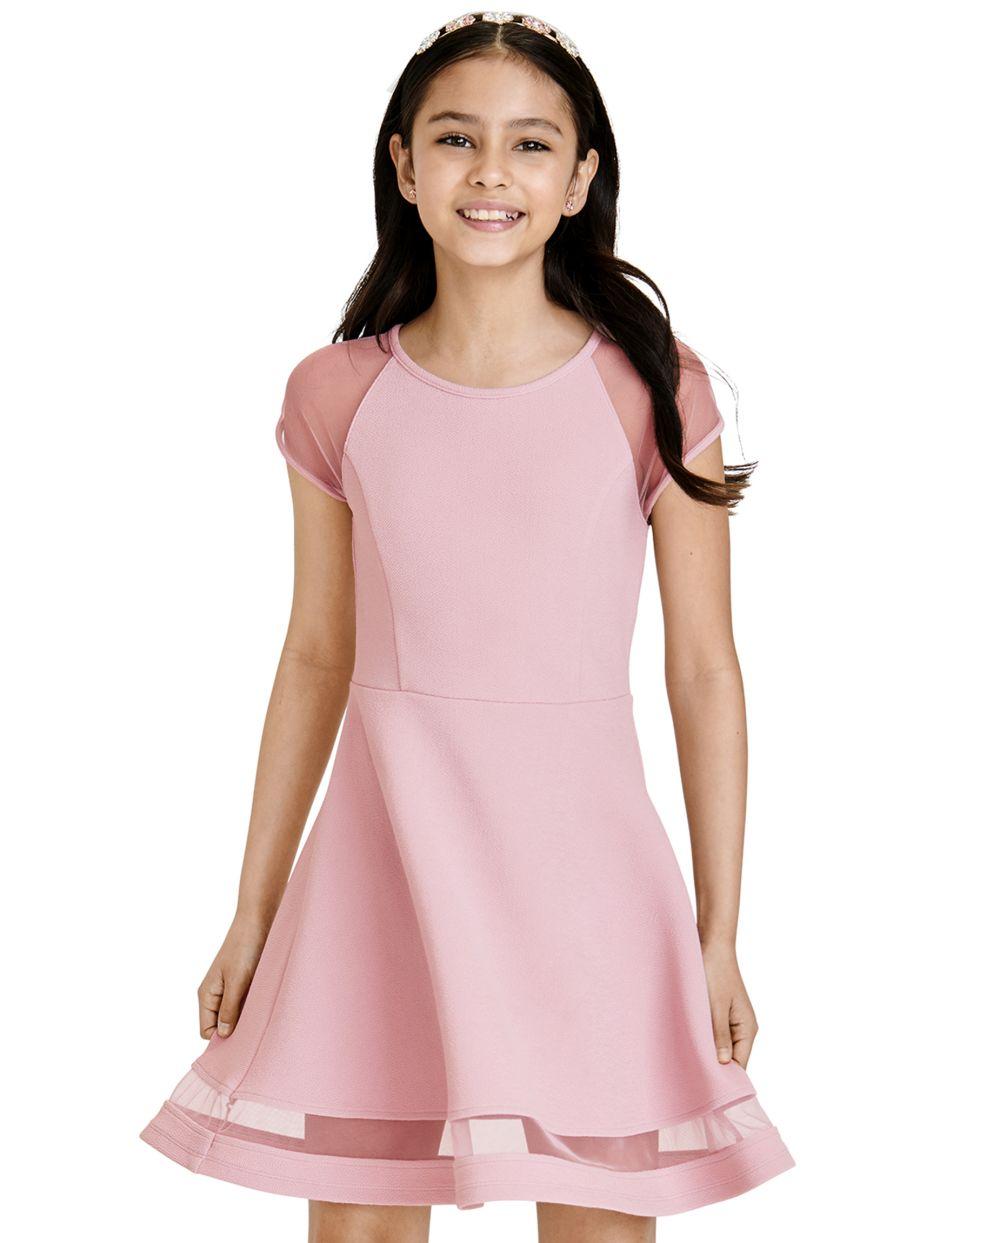 Girls Mesh Stretch Jacquard Dress - Pink